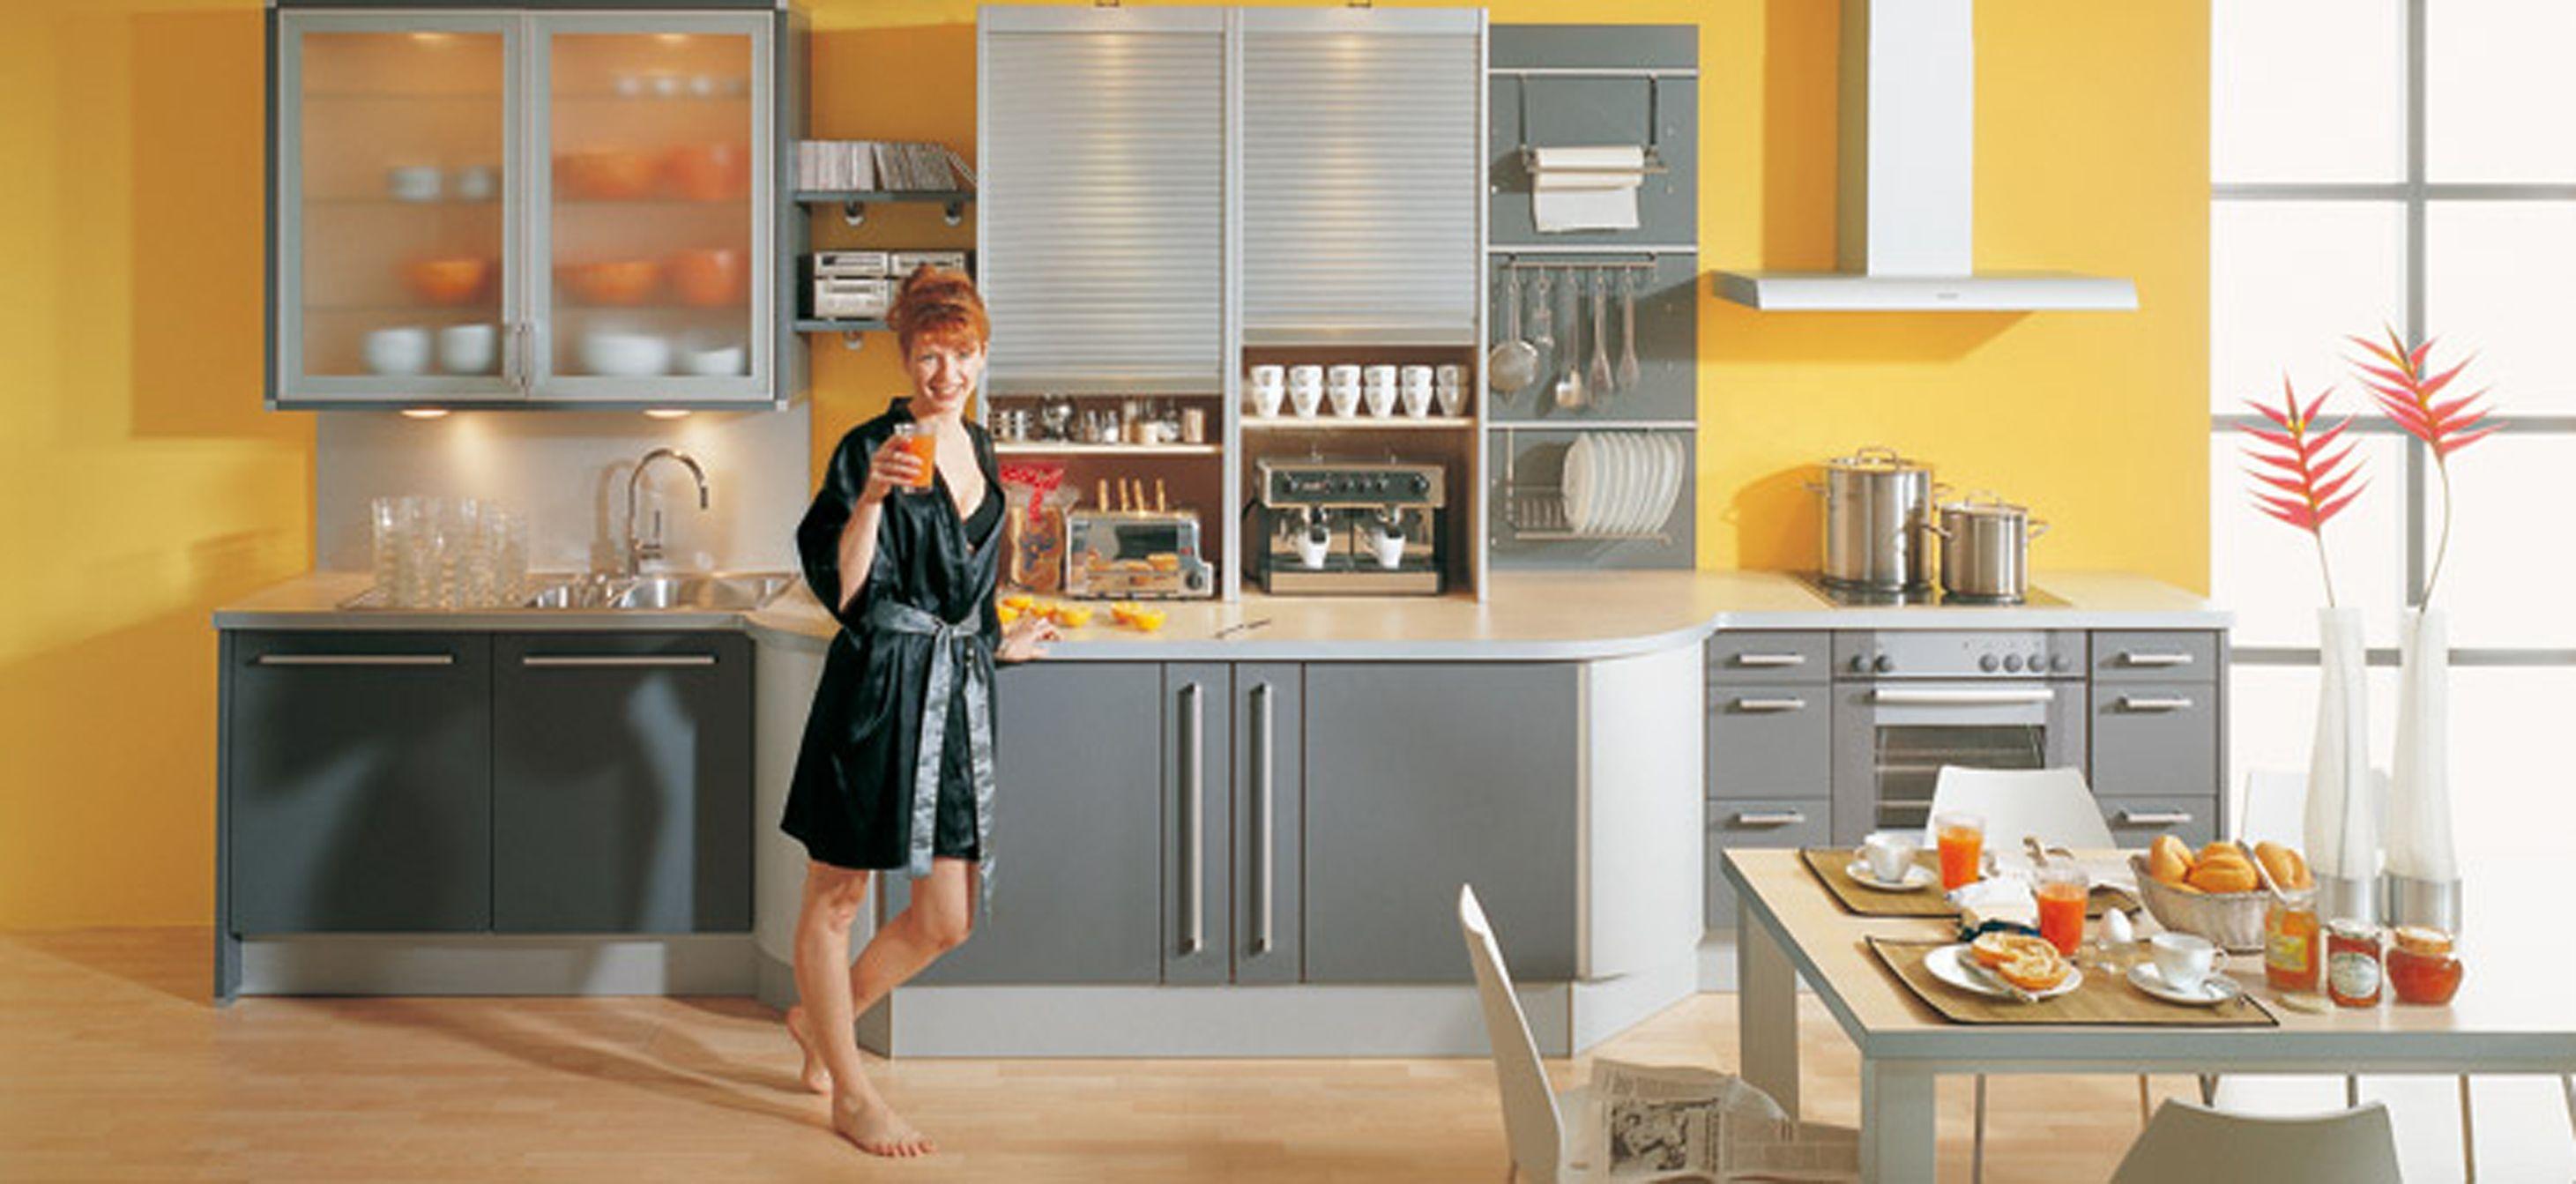 Fullsize Of Unusual Kitchen Designs